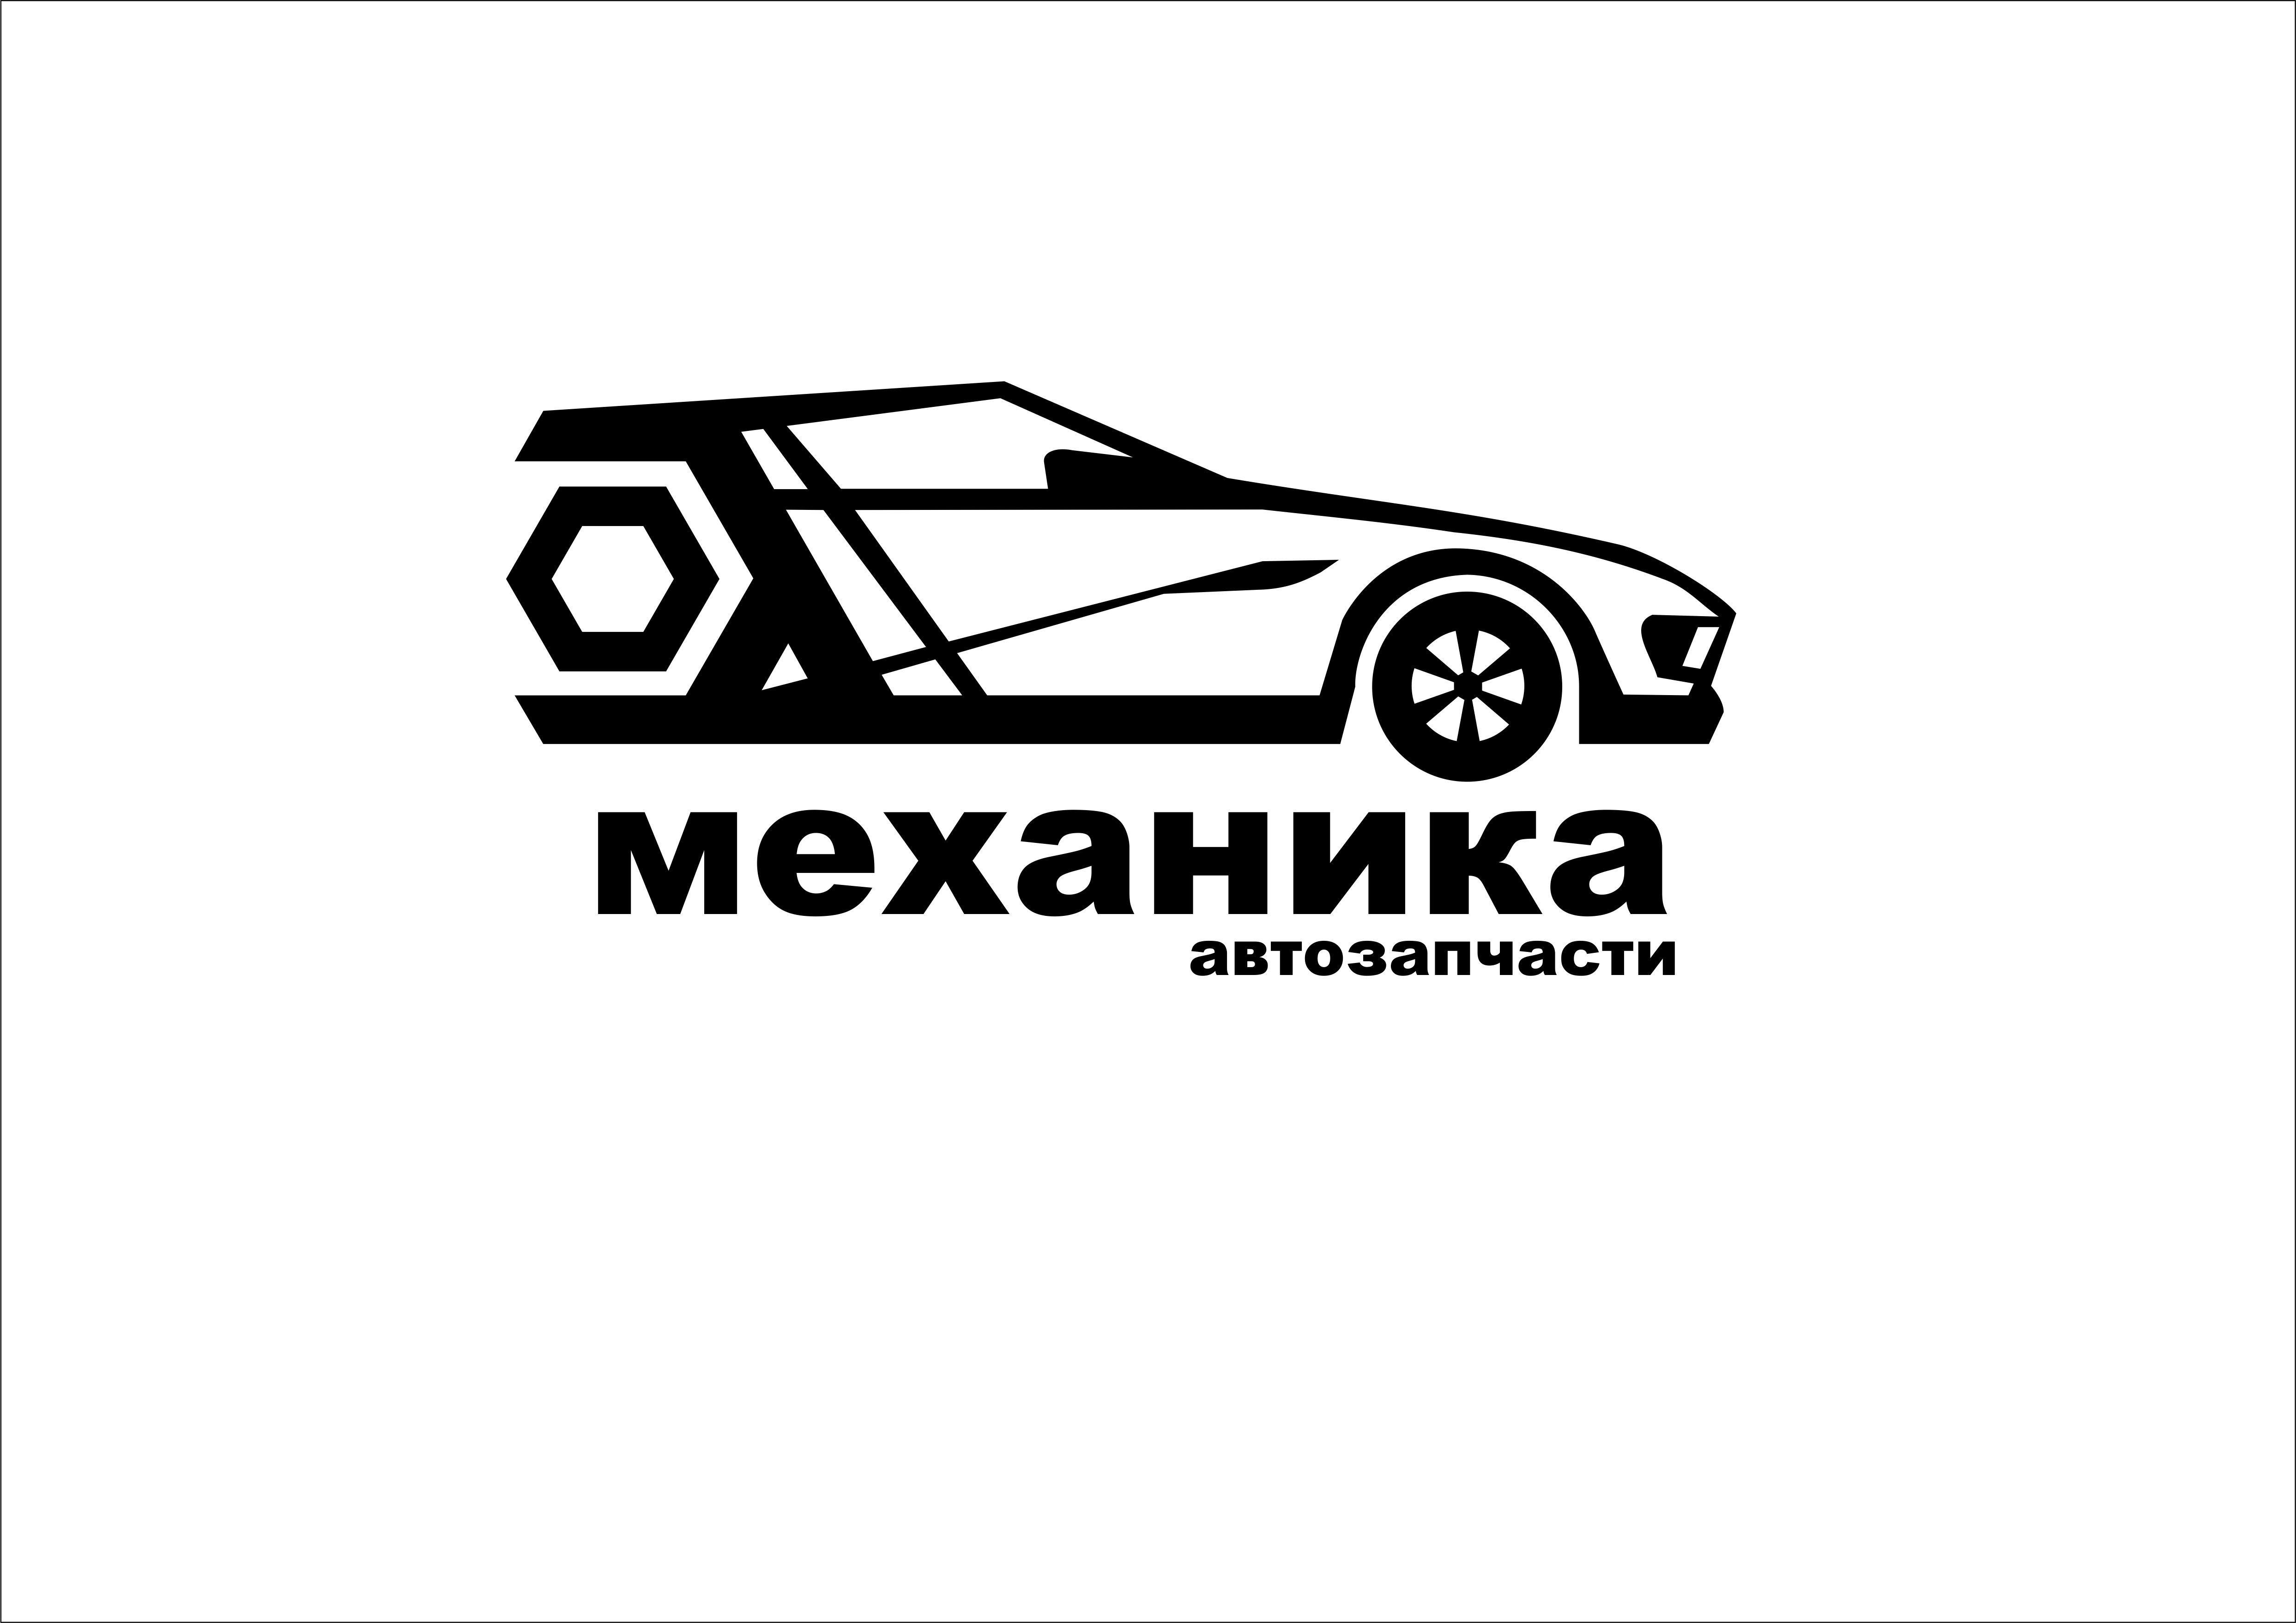 Логотип для магазина автозапчасти 'Механика' - дизайнер Ant0ni0n